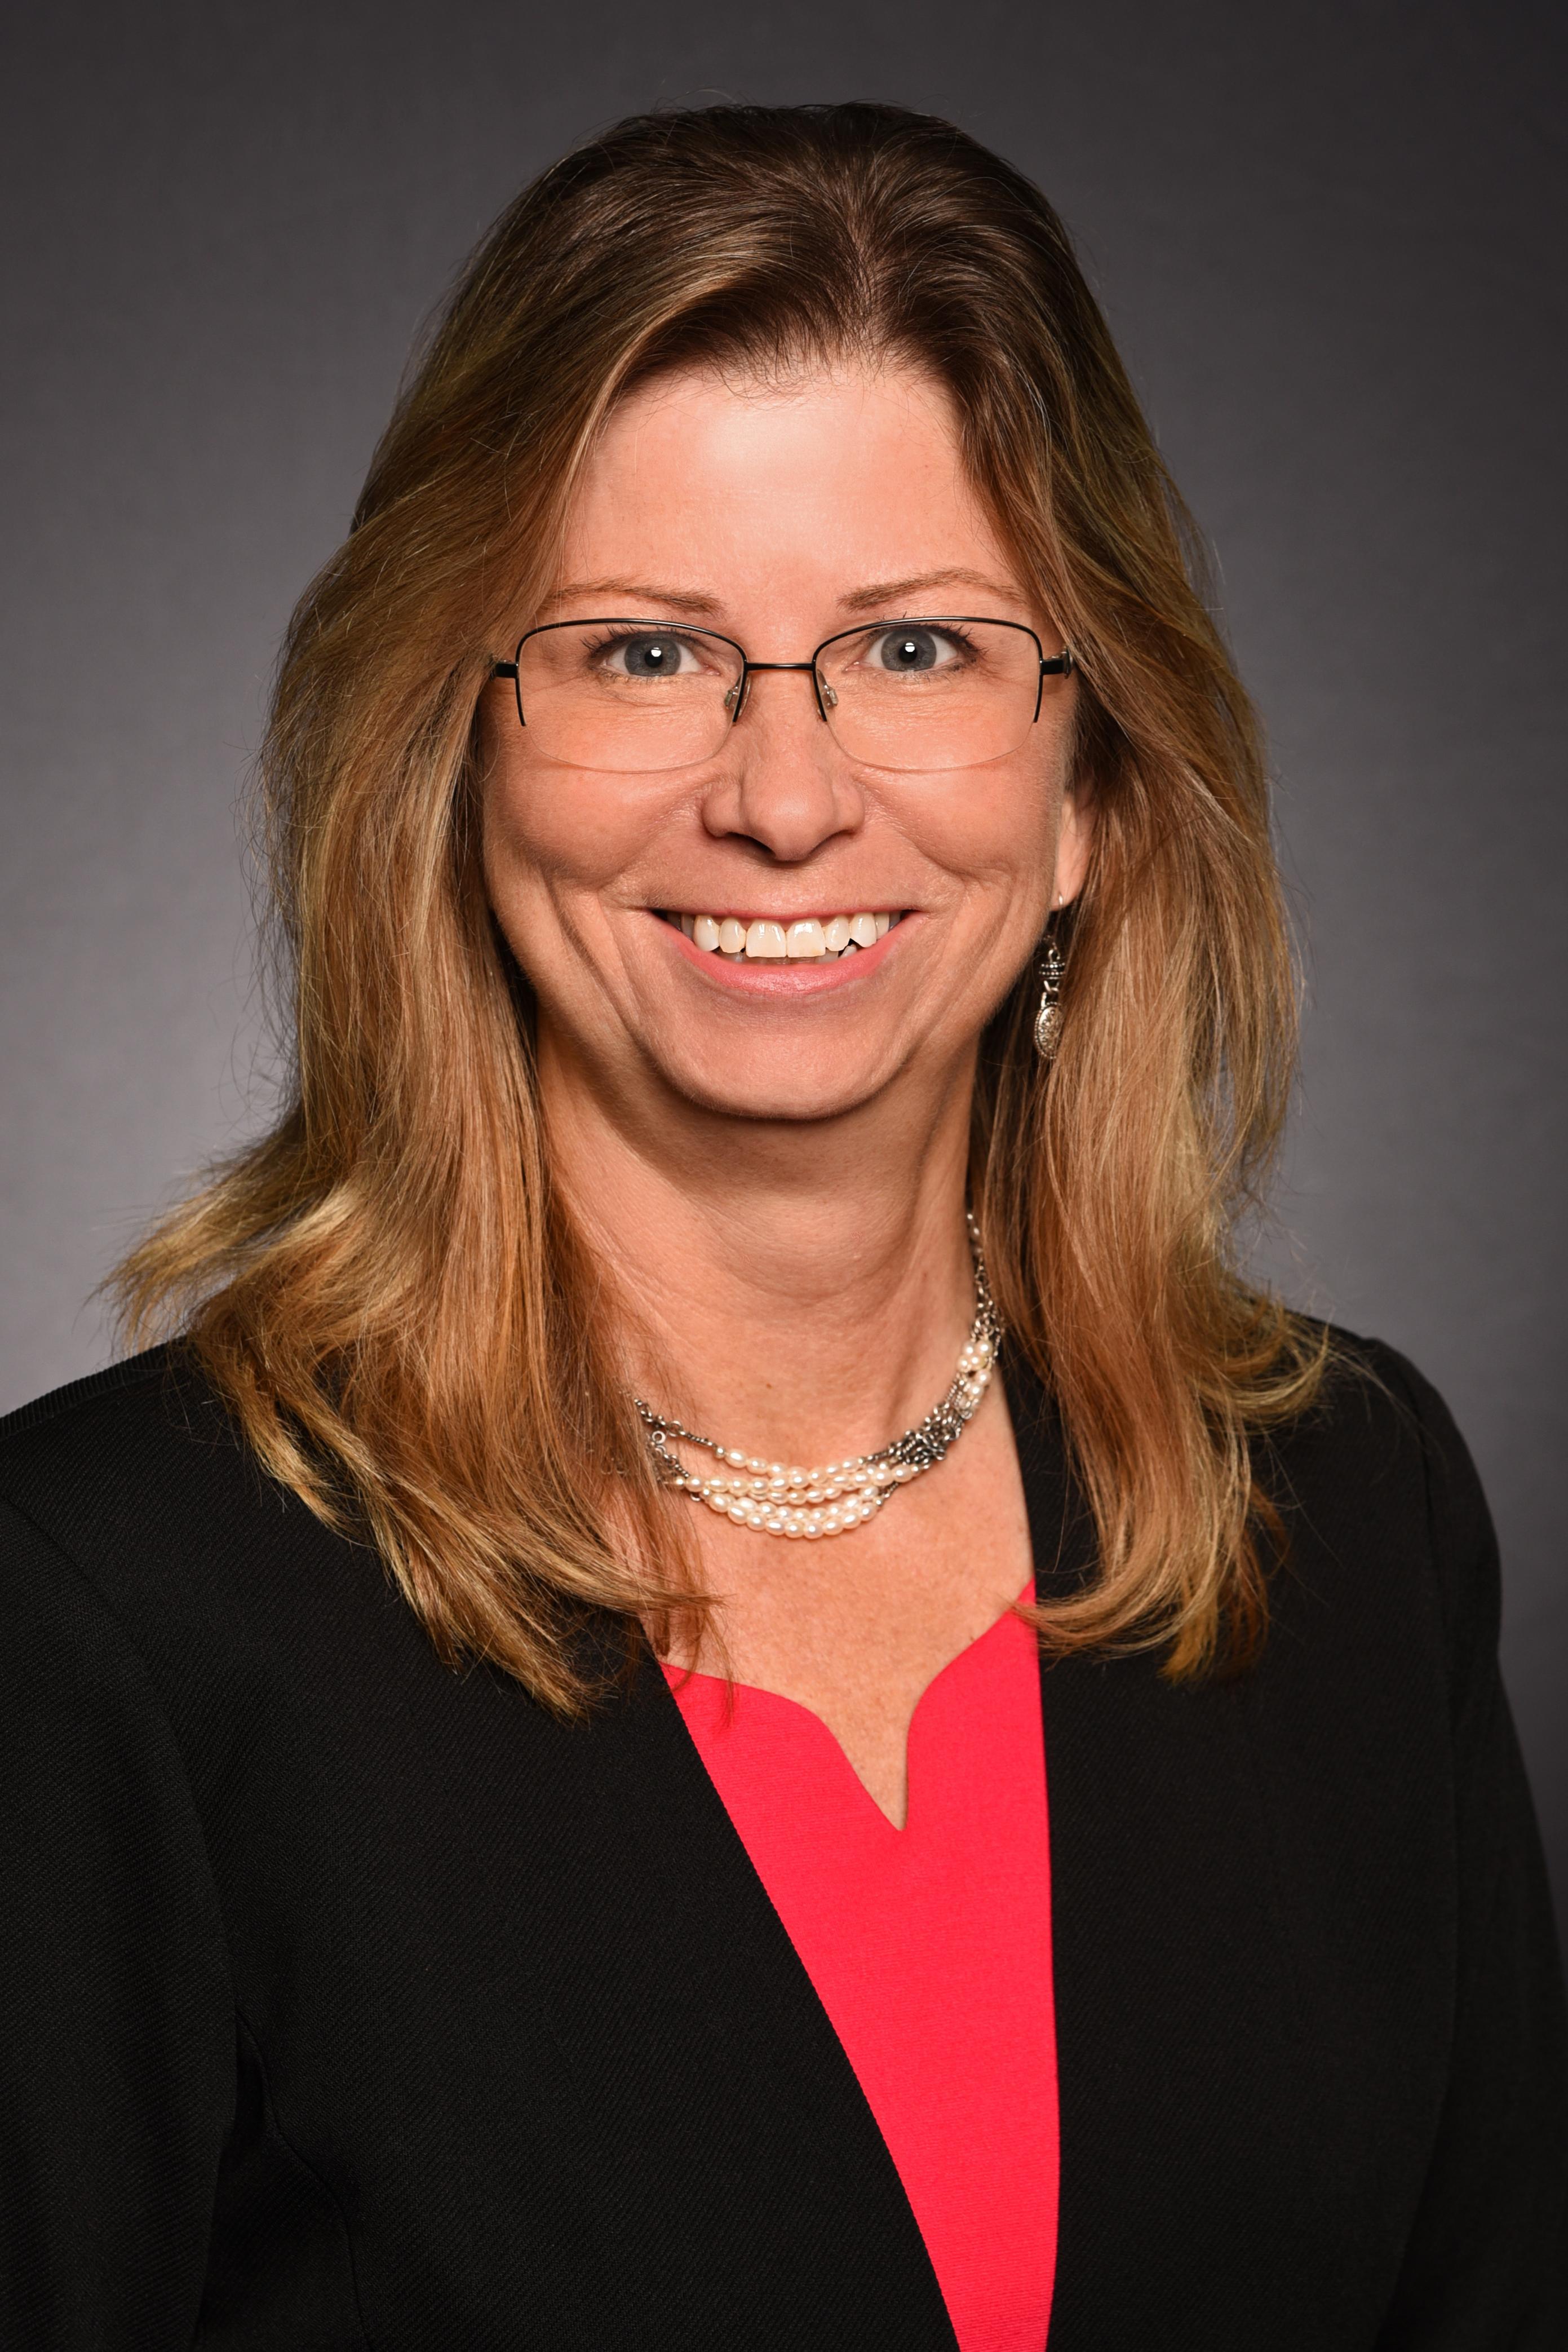 Dr. Angela Baysinger